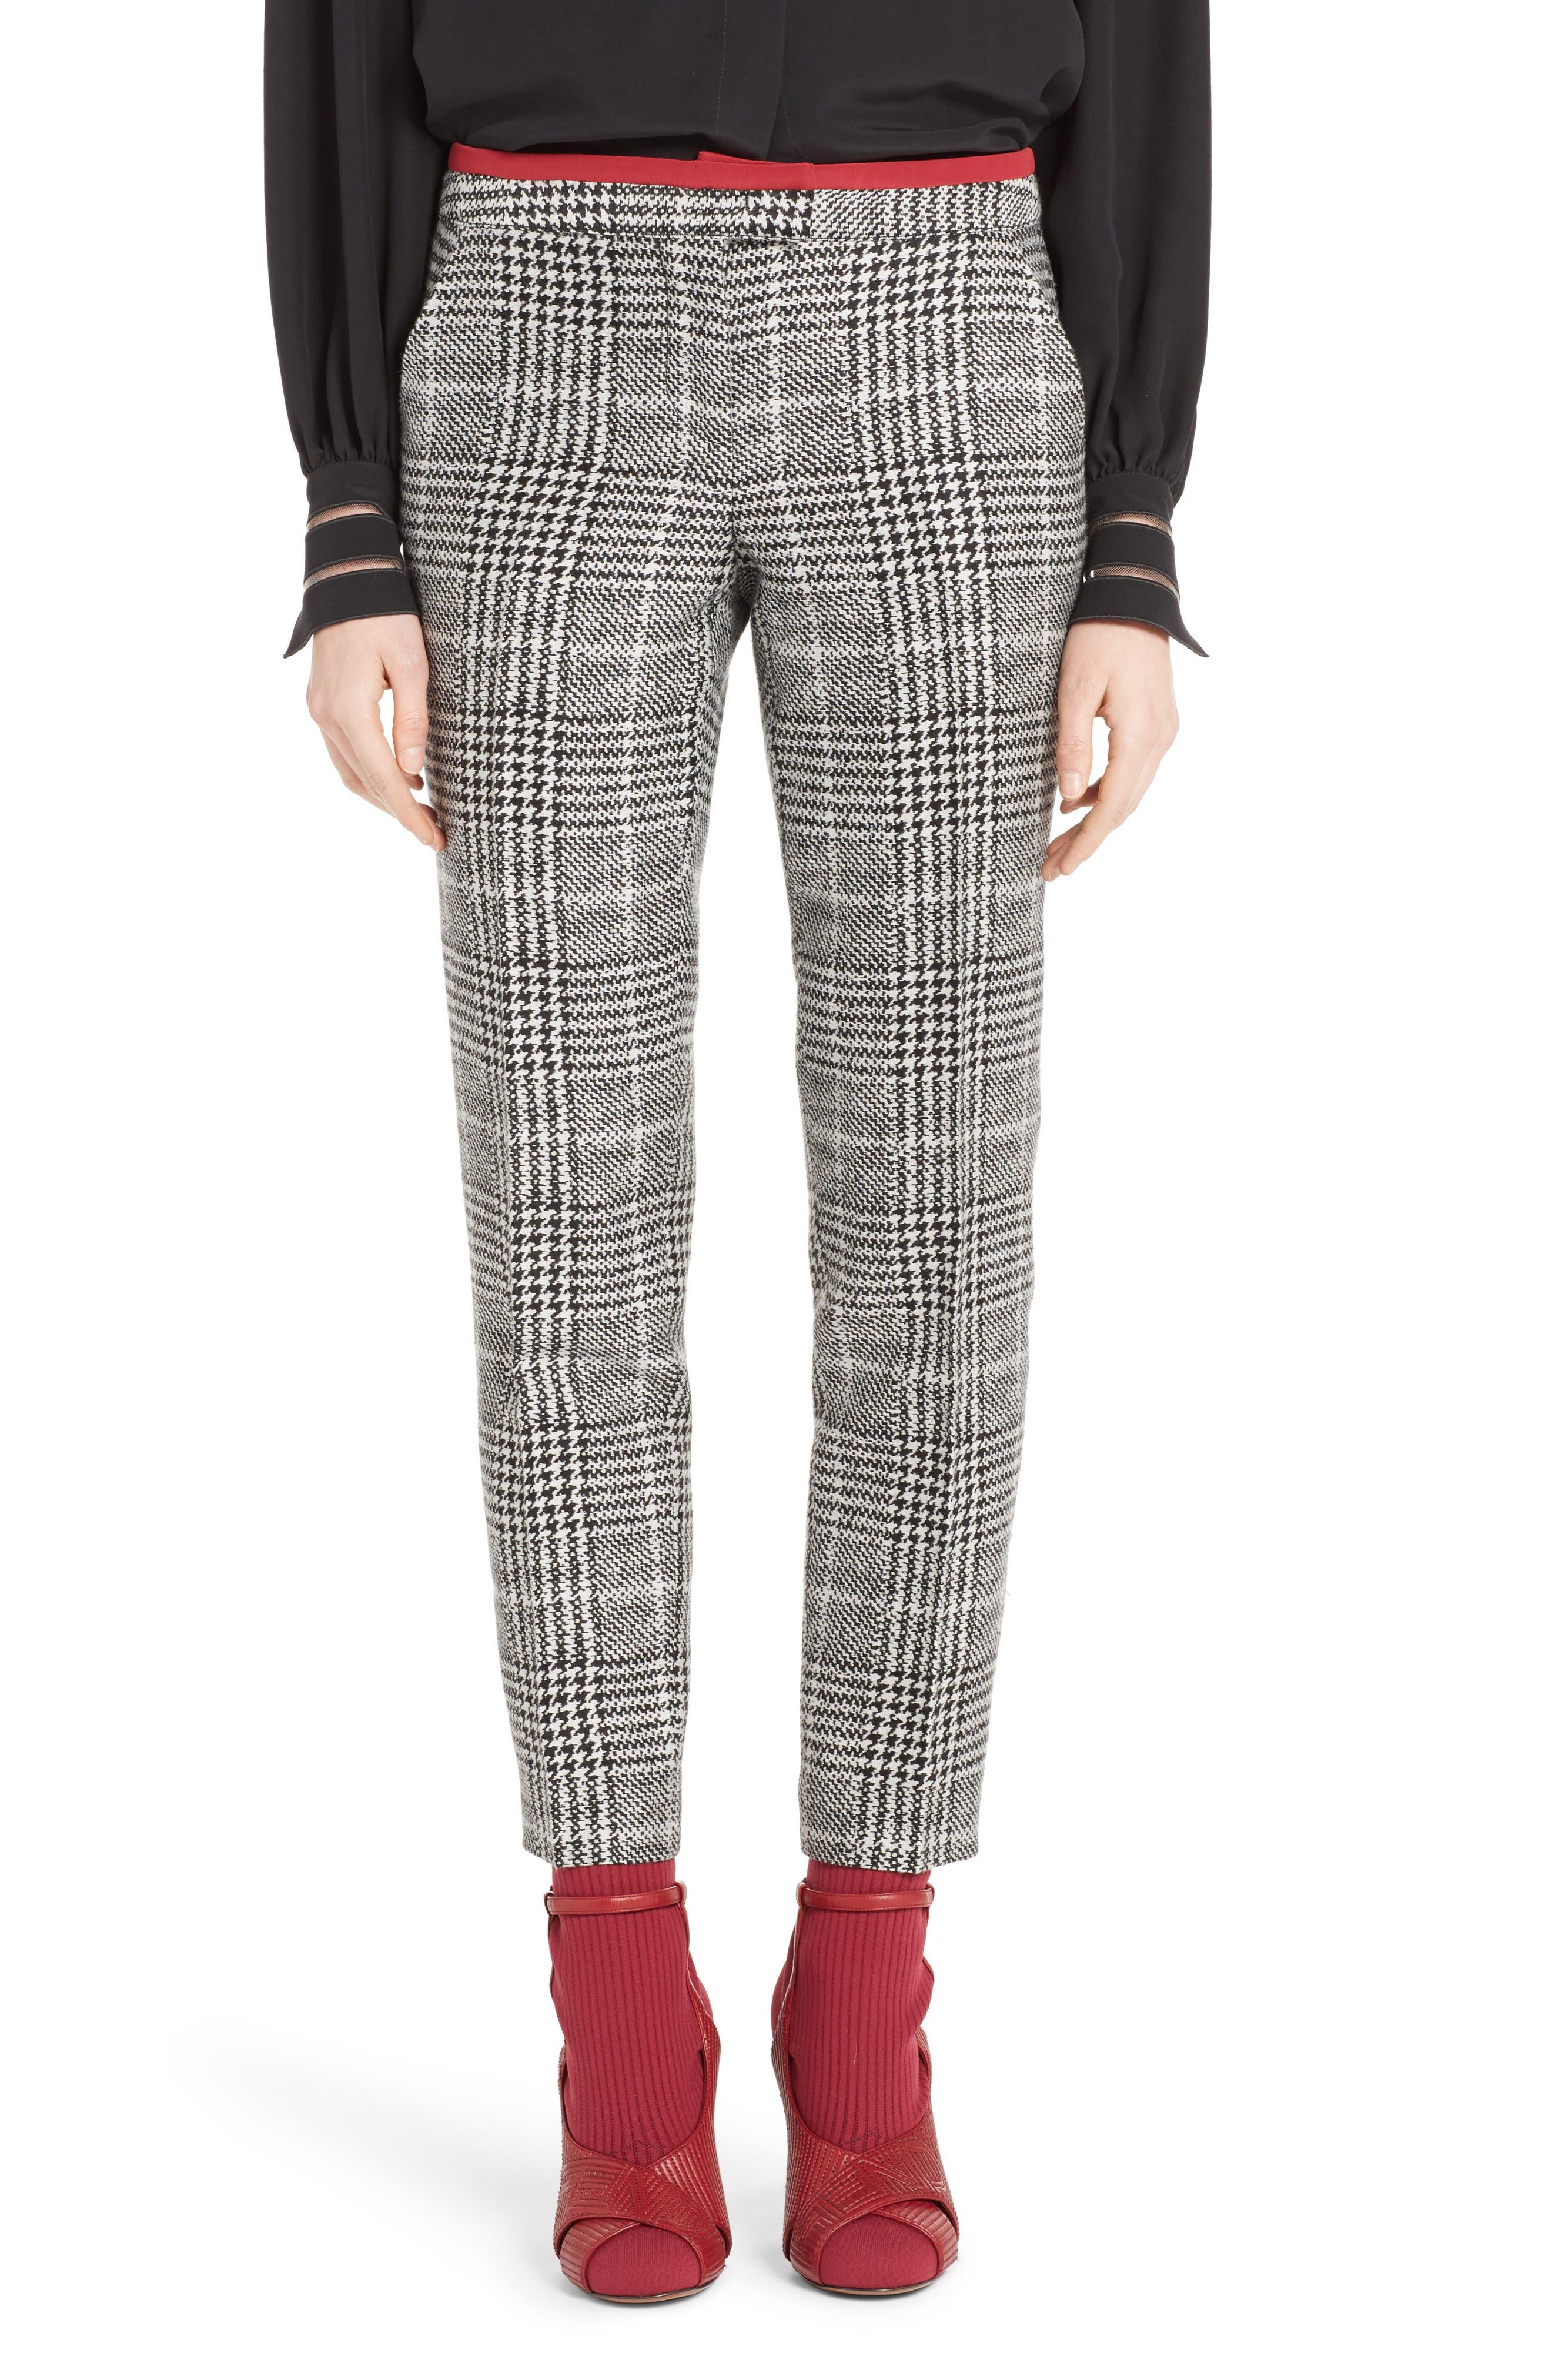 Prince of Wales Print Crop Pants,                             Main thumbnail 1, color,                             Black/ White